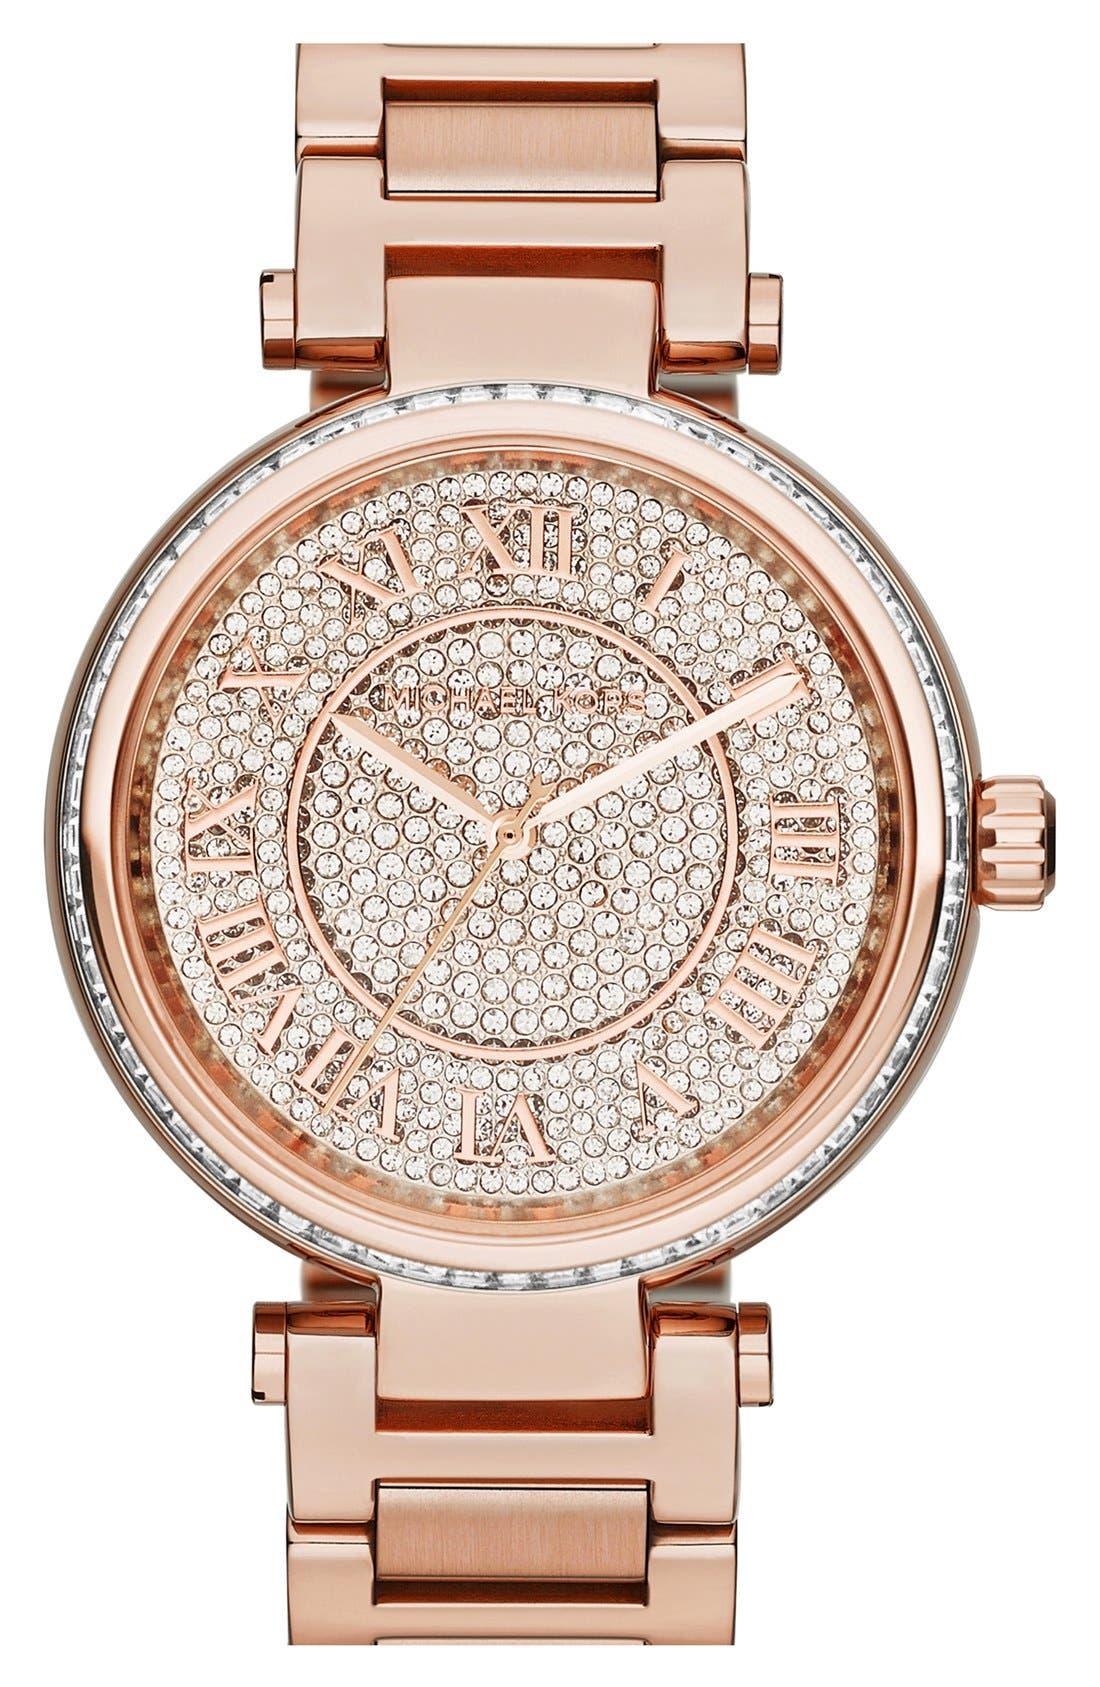 Alternate Image 1 Selected - Michael Kors 'Skylar' Pavé Dial Bracelet Watch, 42mm